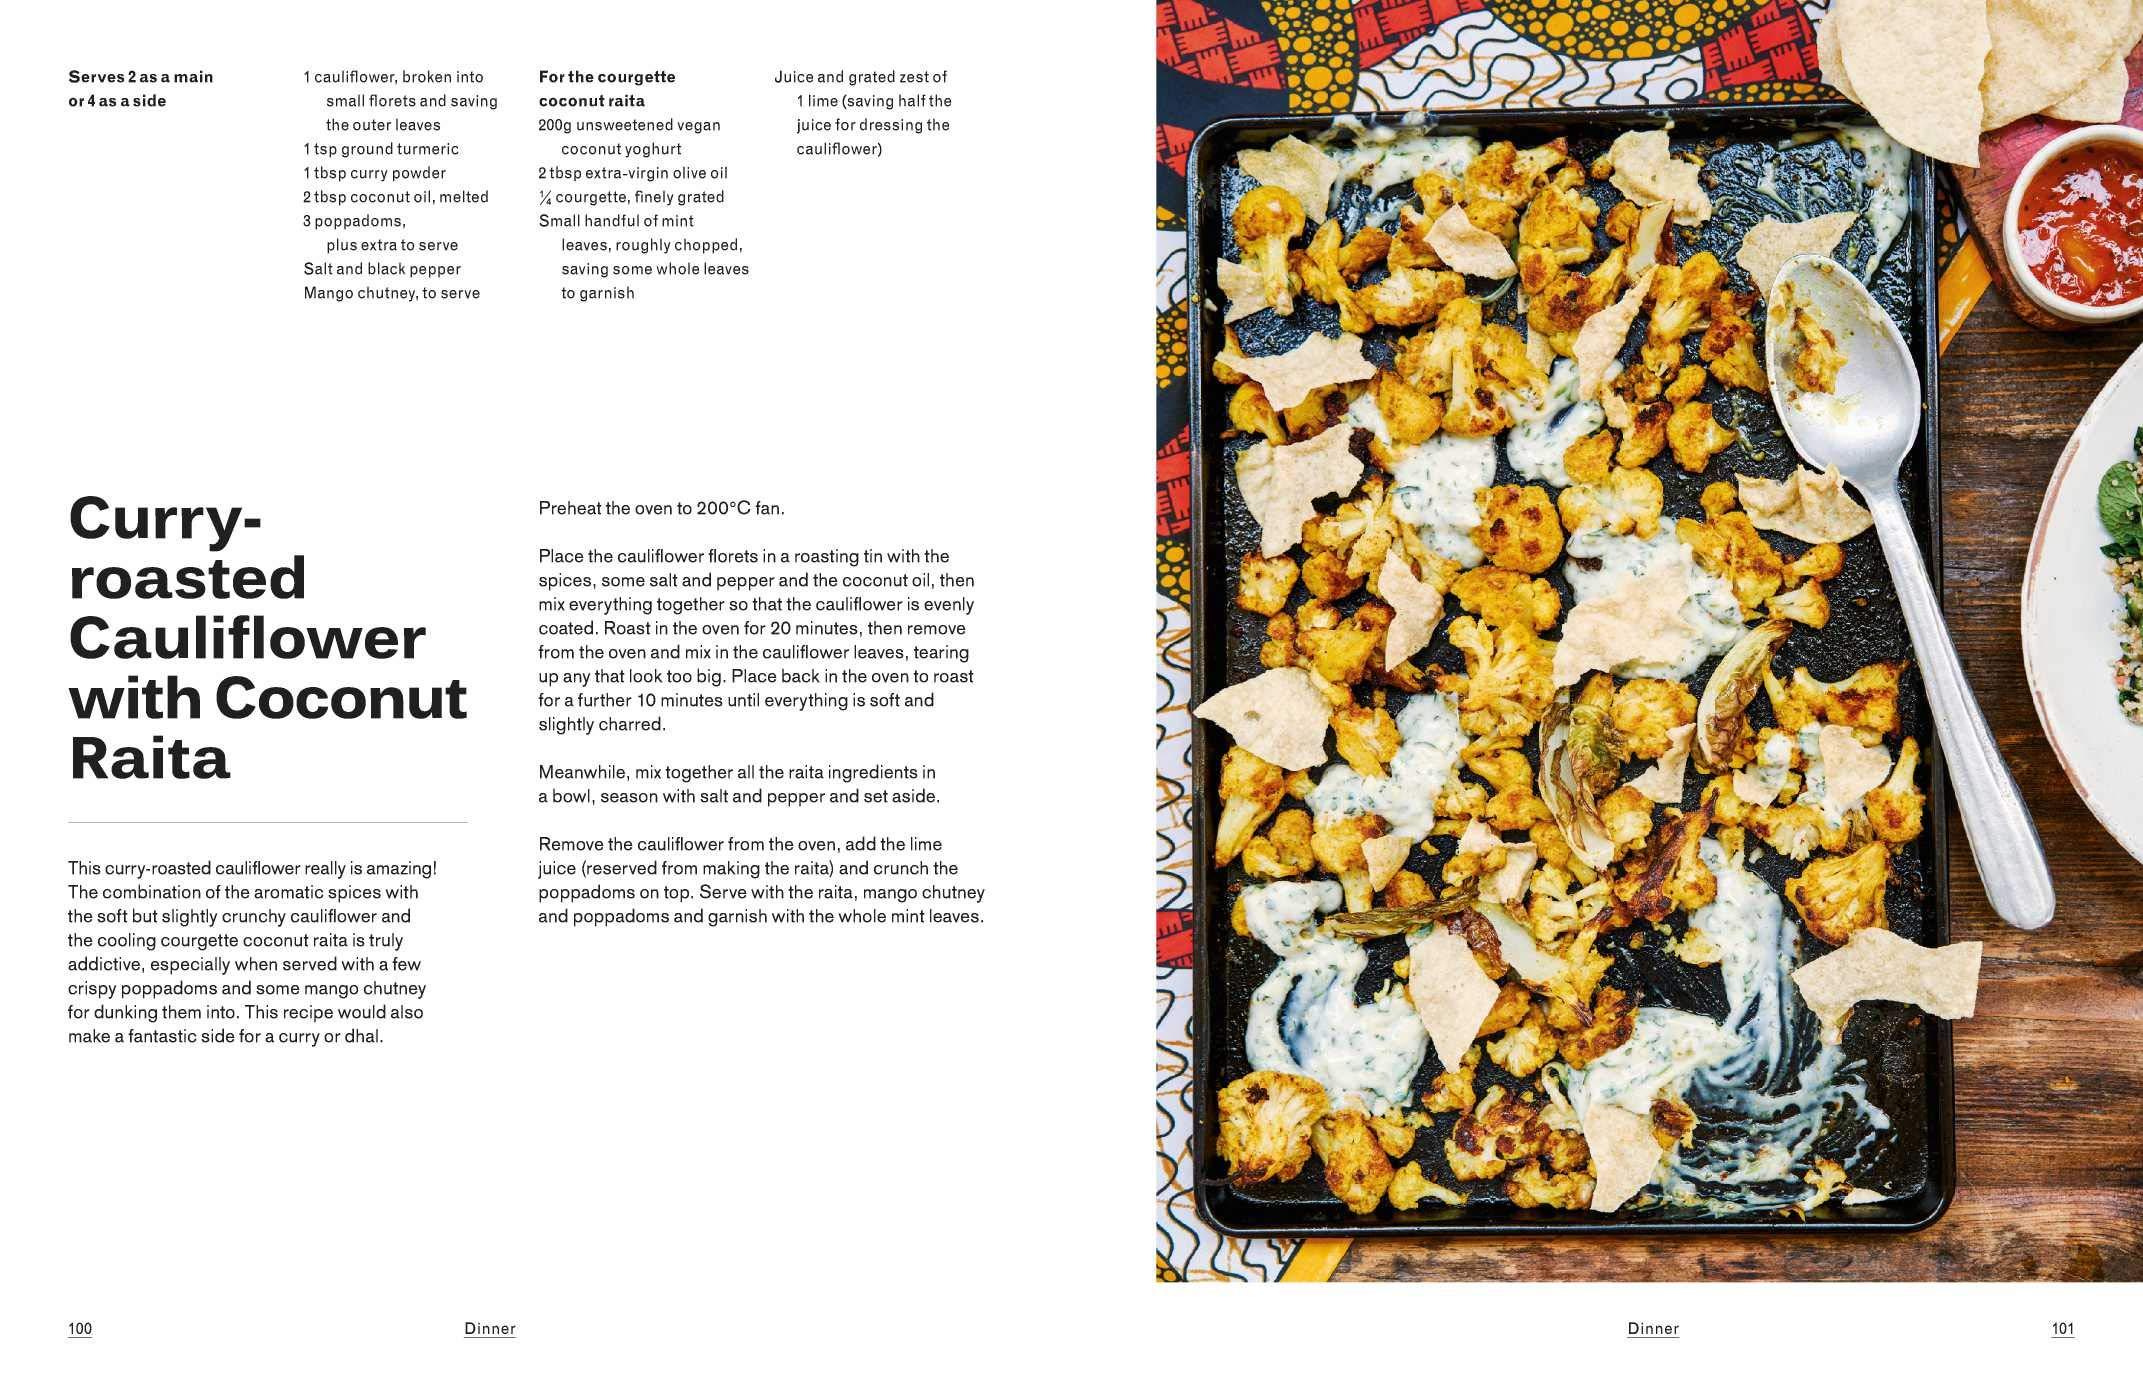 Rachel Ama's Vegan Eats: Tasty plant-based recipes for every day 7